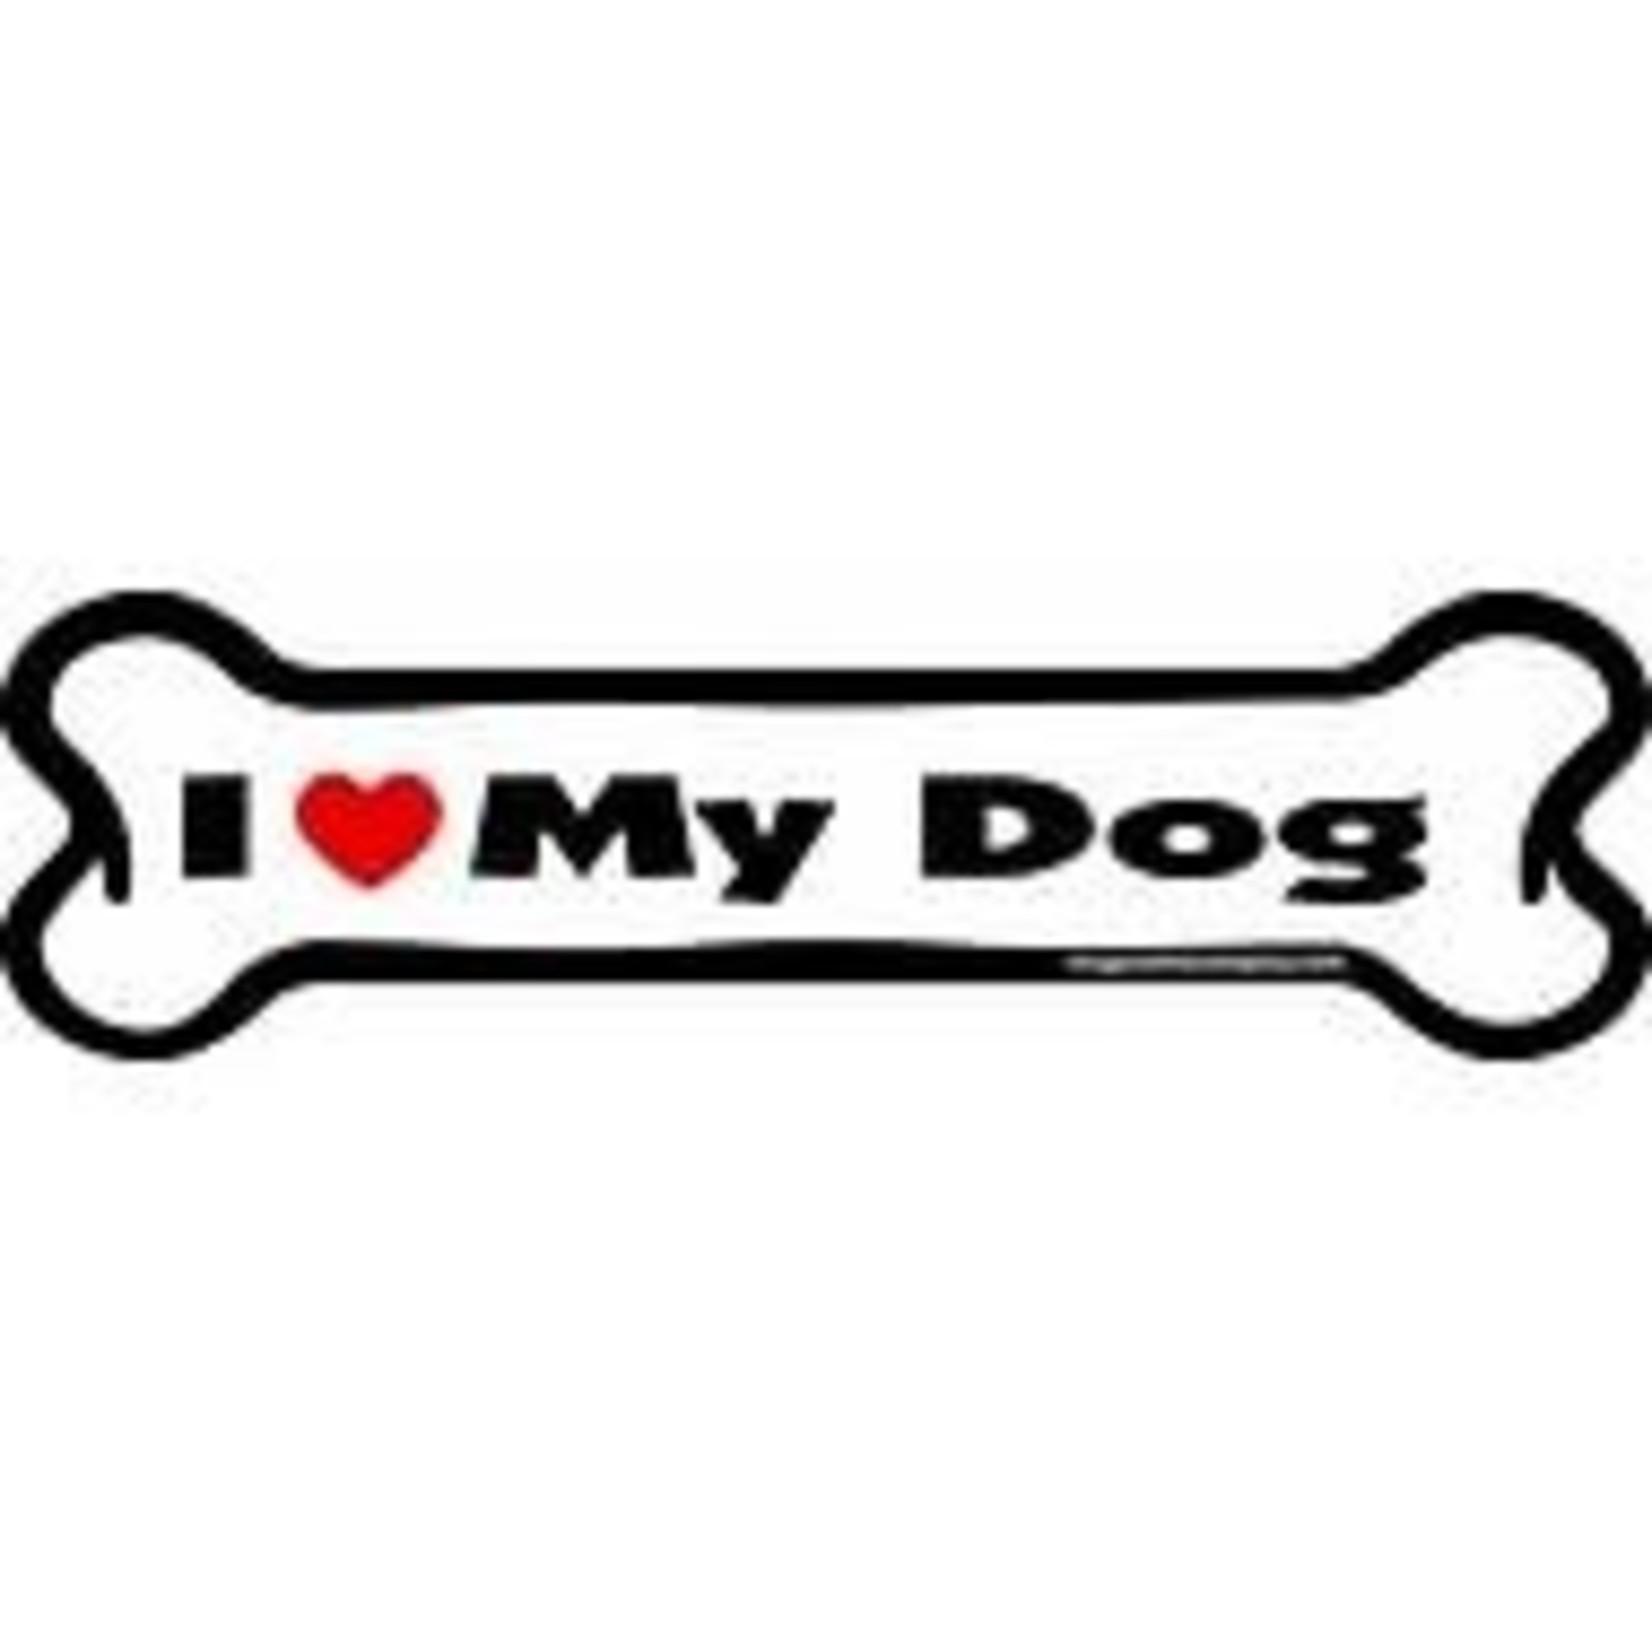 IMAGINETHIS Bone Magnet I Love My Dog